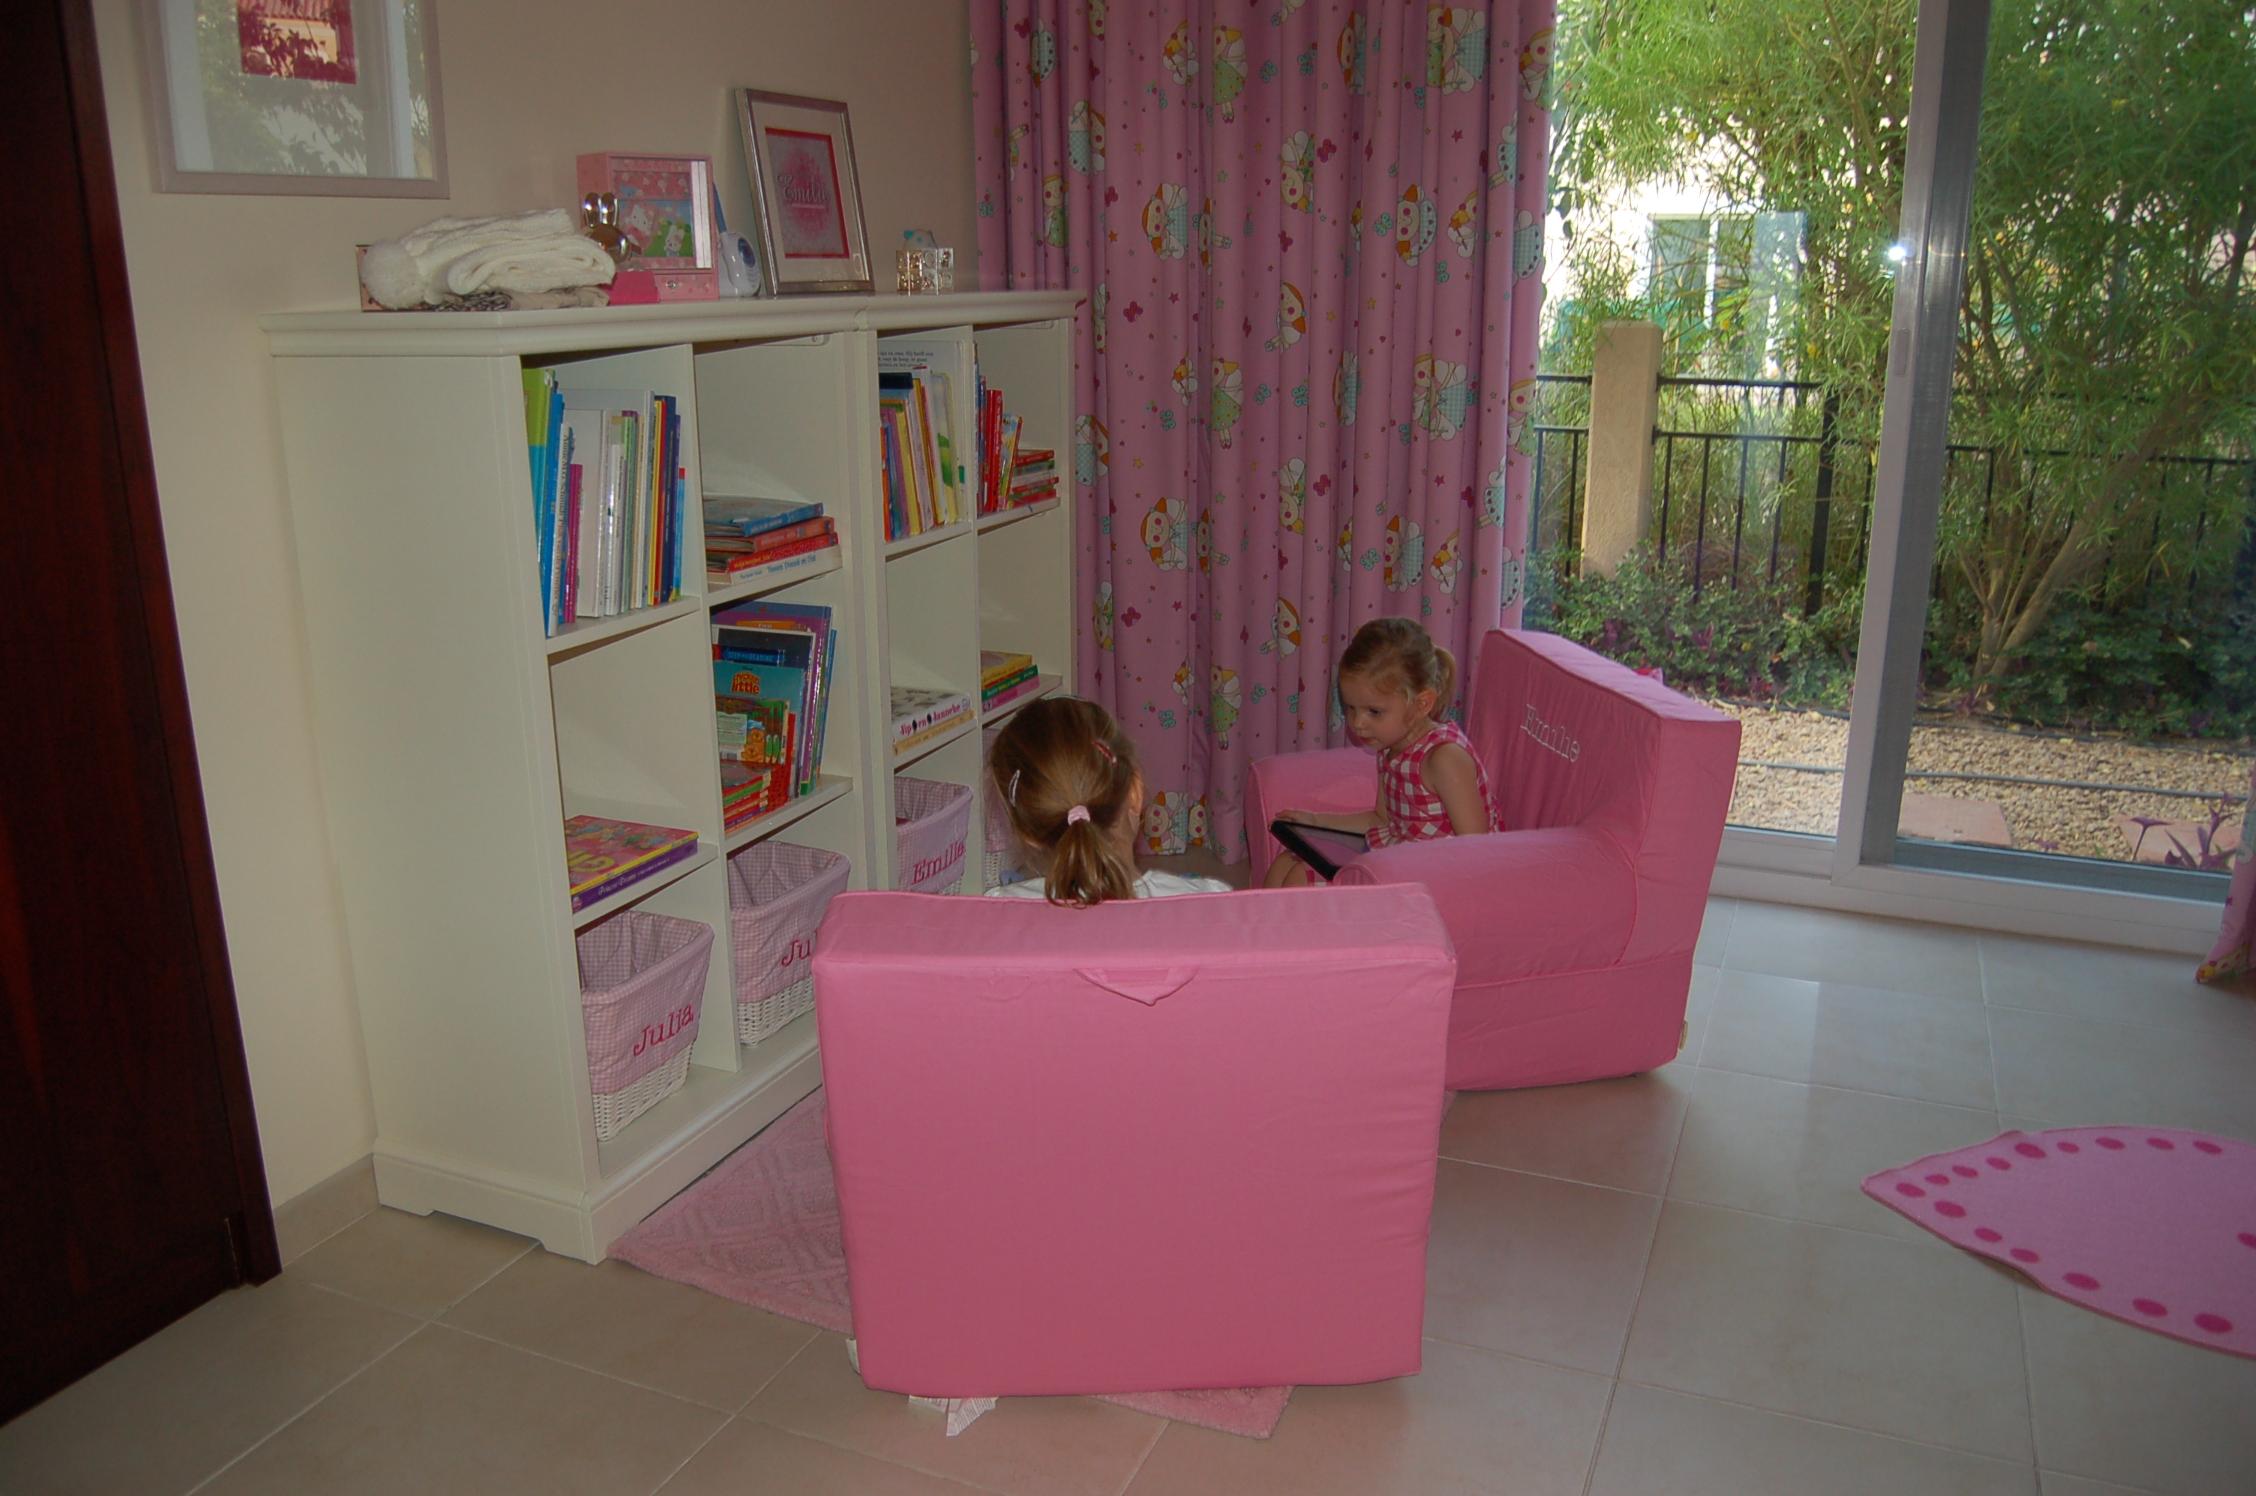 Nieuwe kamer voor de meiden kurt sanne julia en emilie frenier - Deco slaapkamer meisje jaar ...